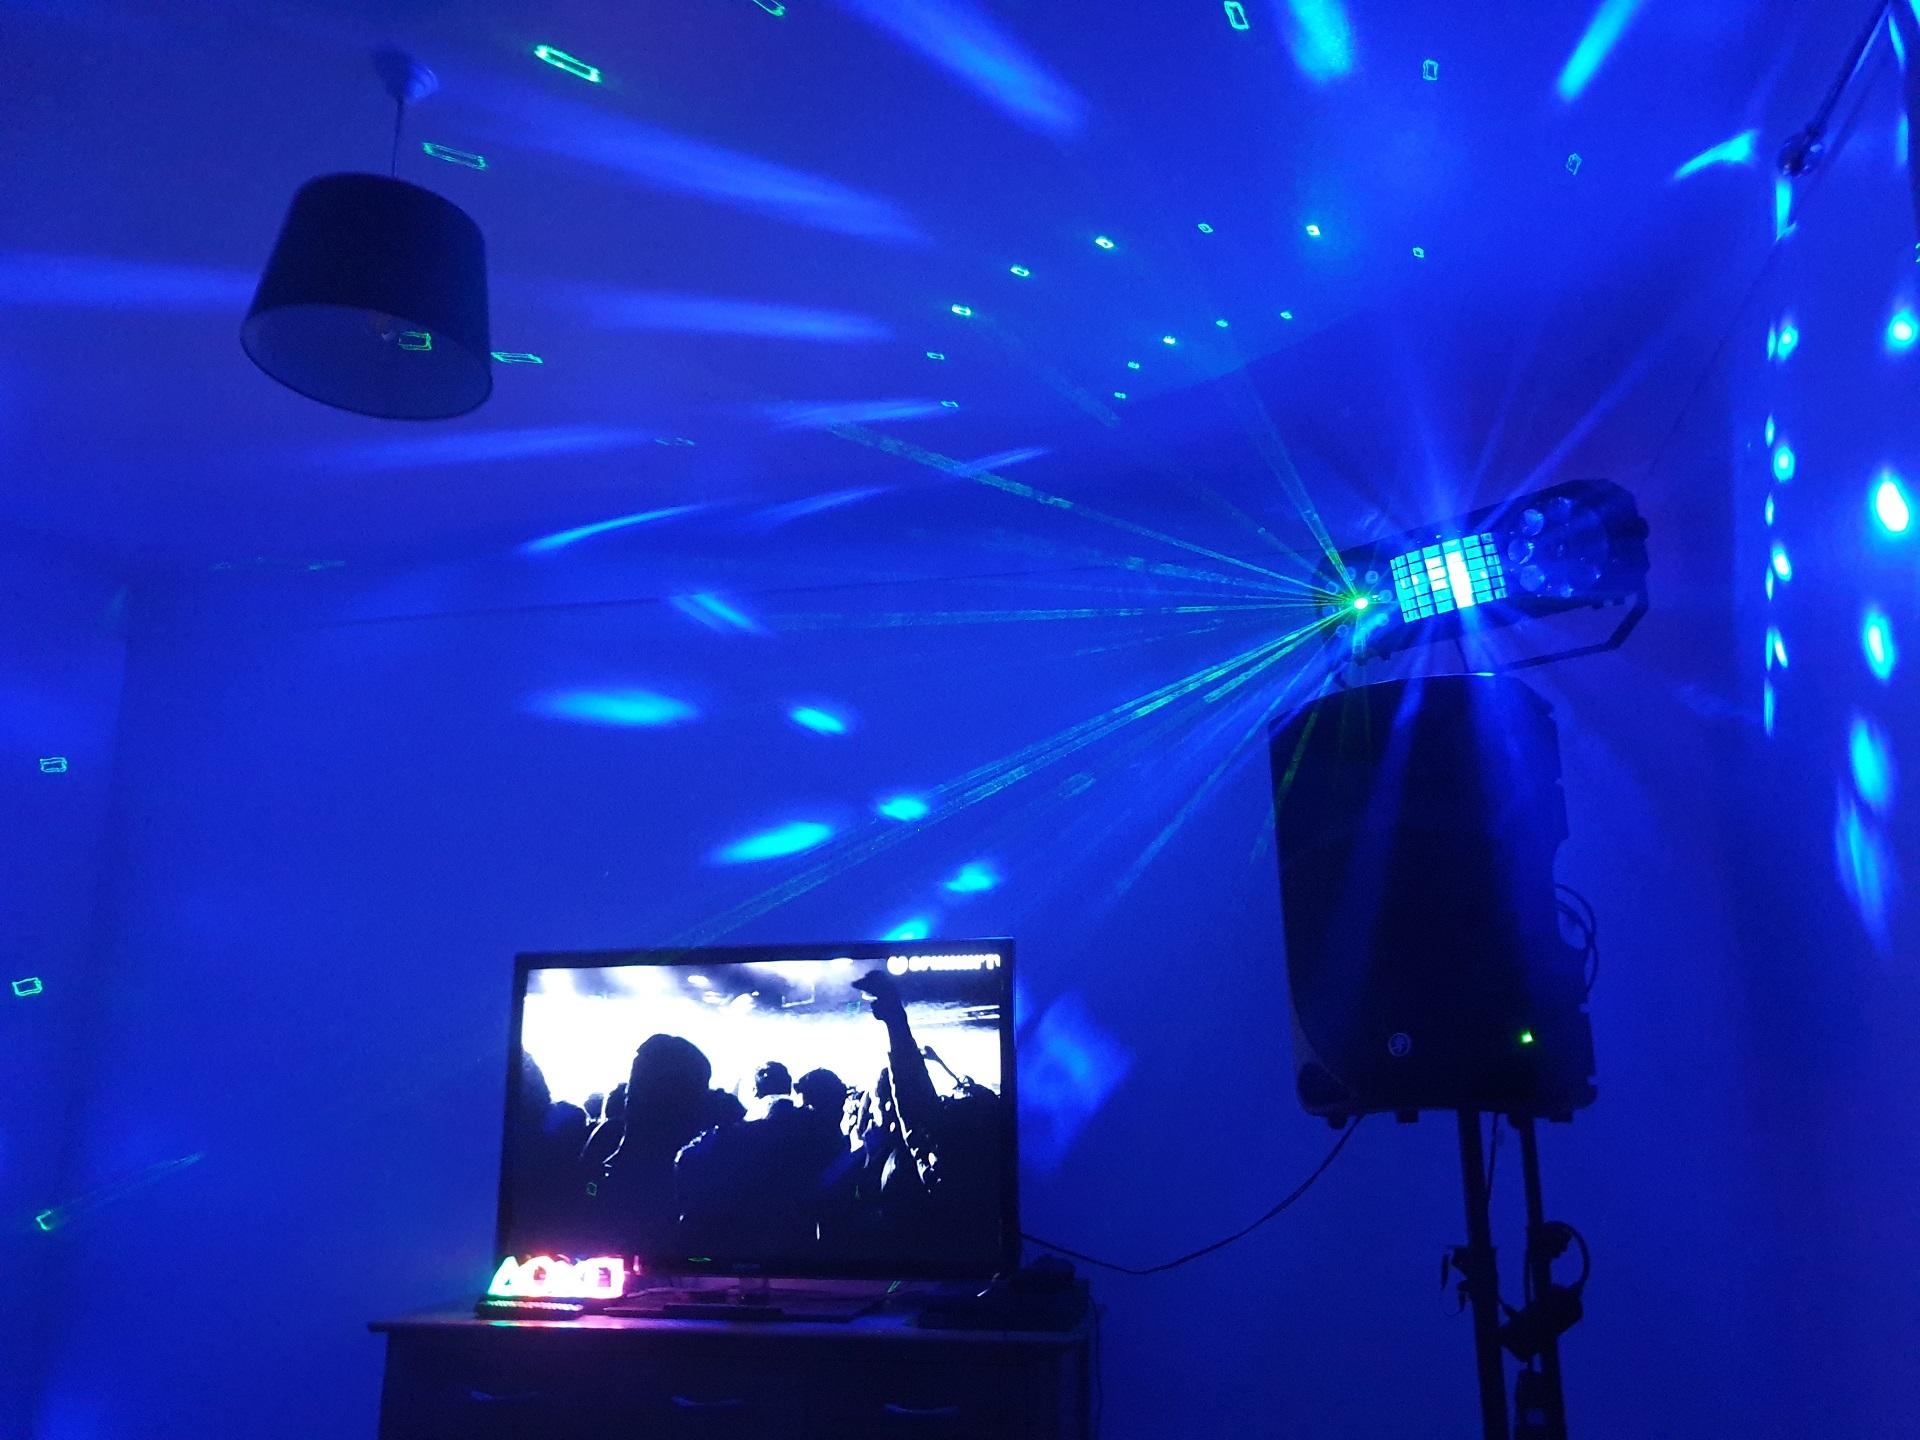 DJ Party Disco Light Hire Exeter Southampton House Garden Party Parties